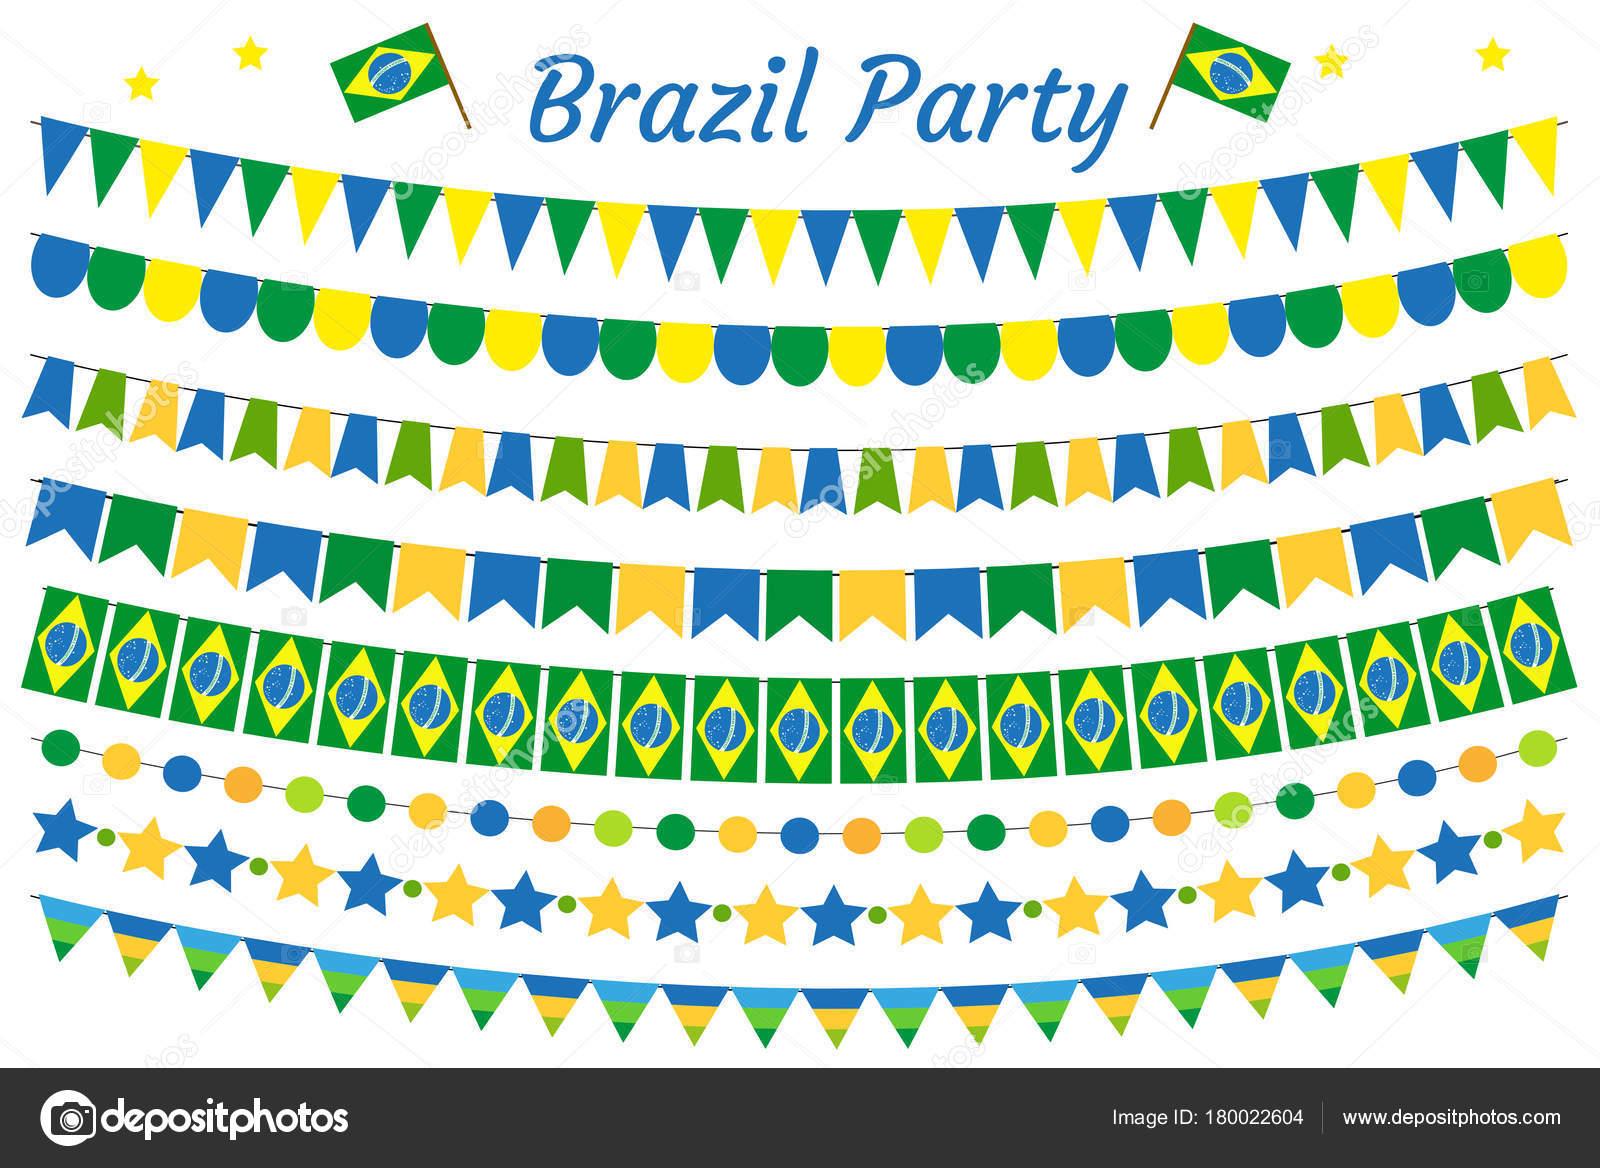 Brasilien Girlande Satz Brasilianische Festschmuck Ammer Party